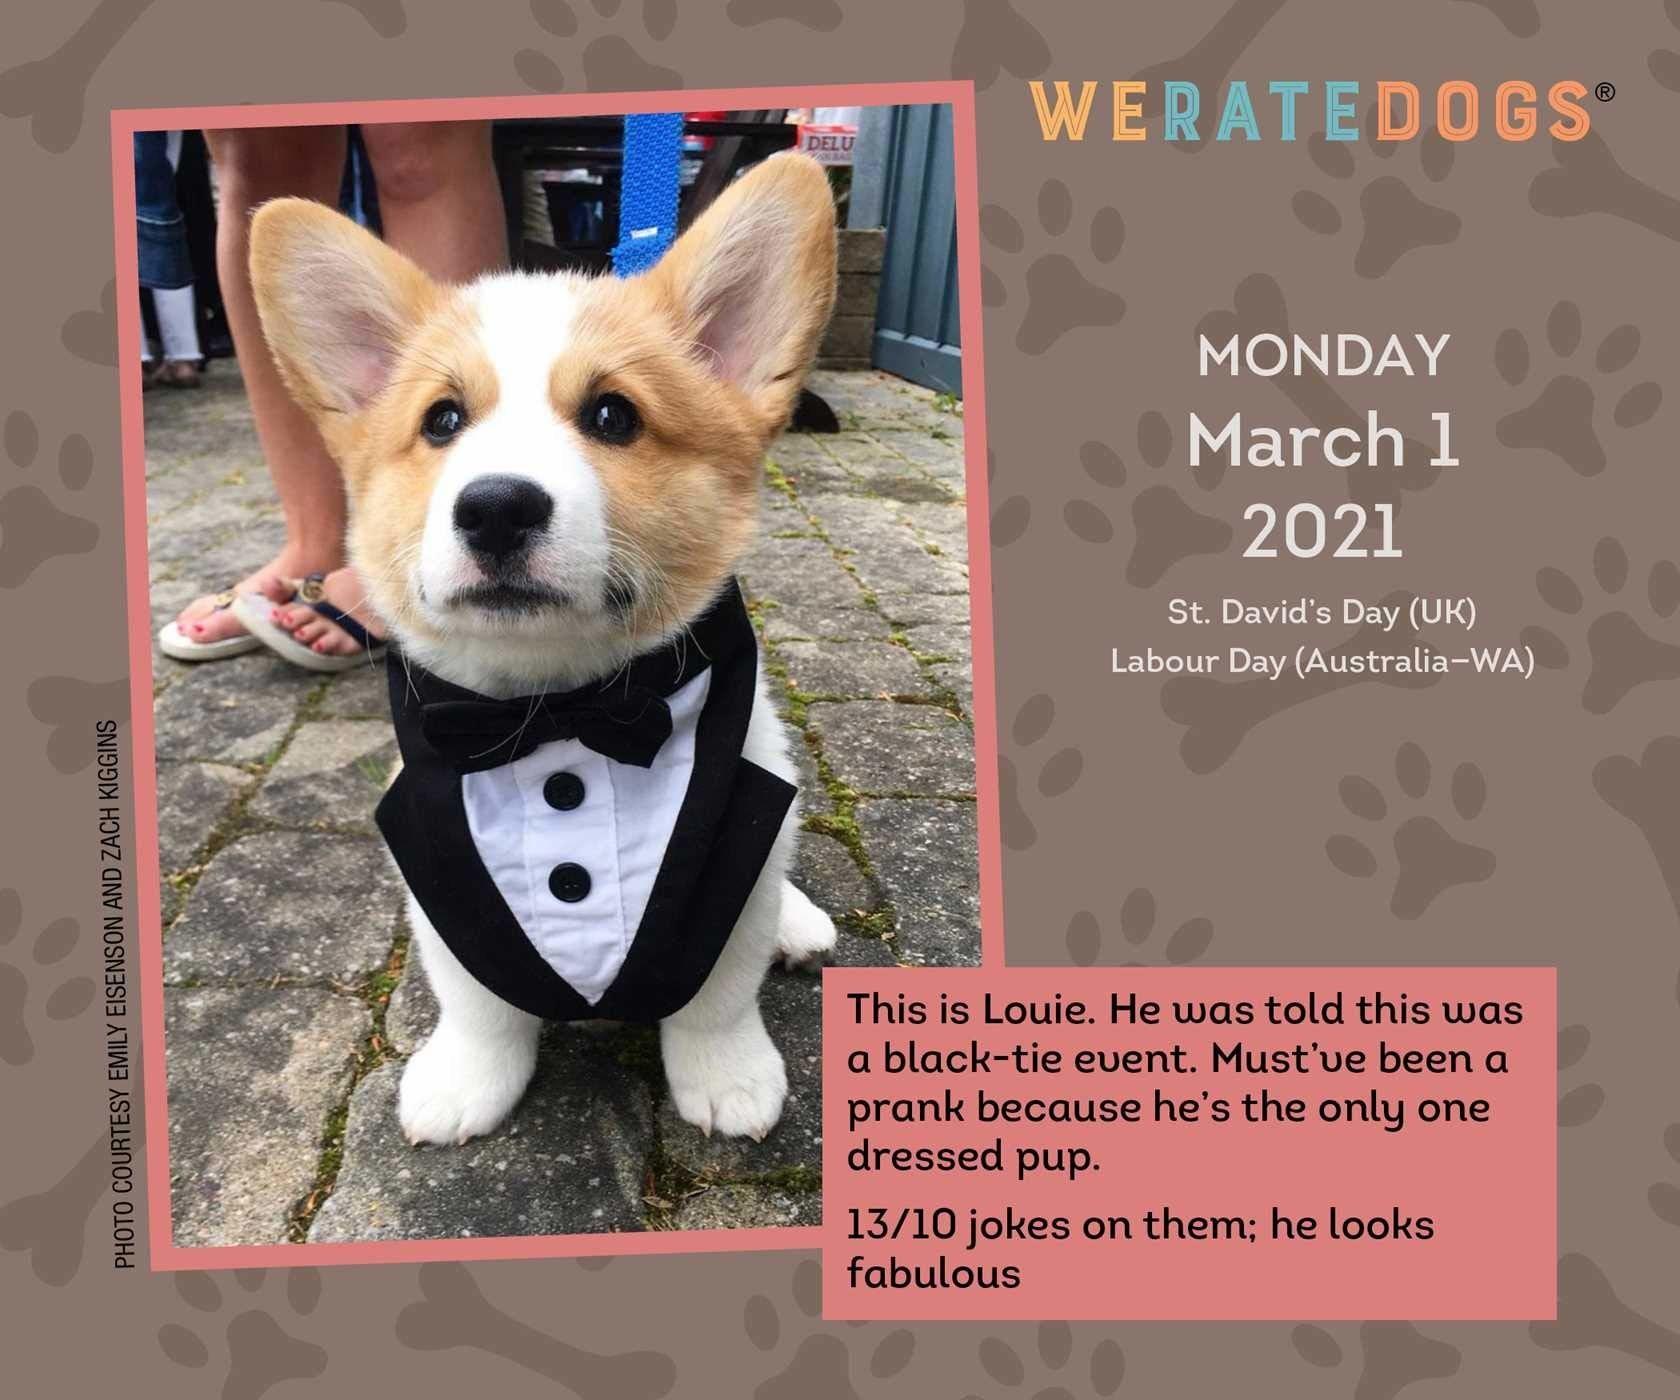 A 2021 calendar with a dog in a tux